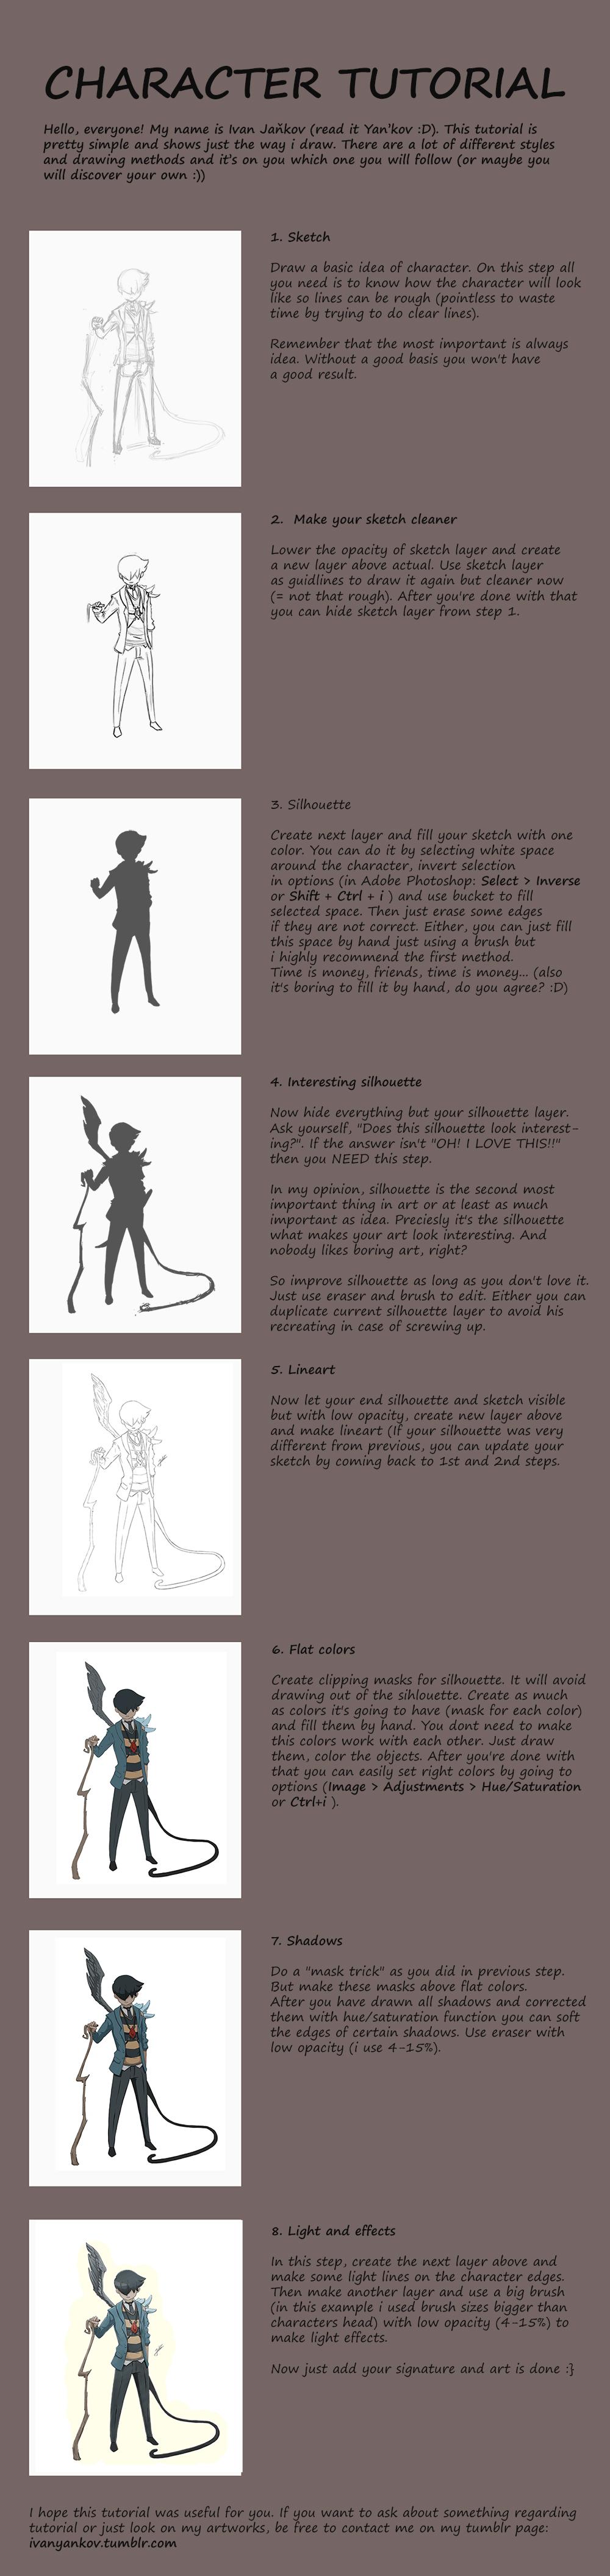 Character tutorial